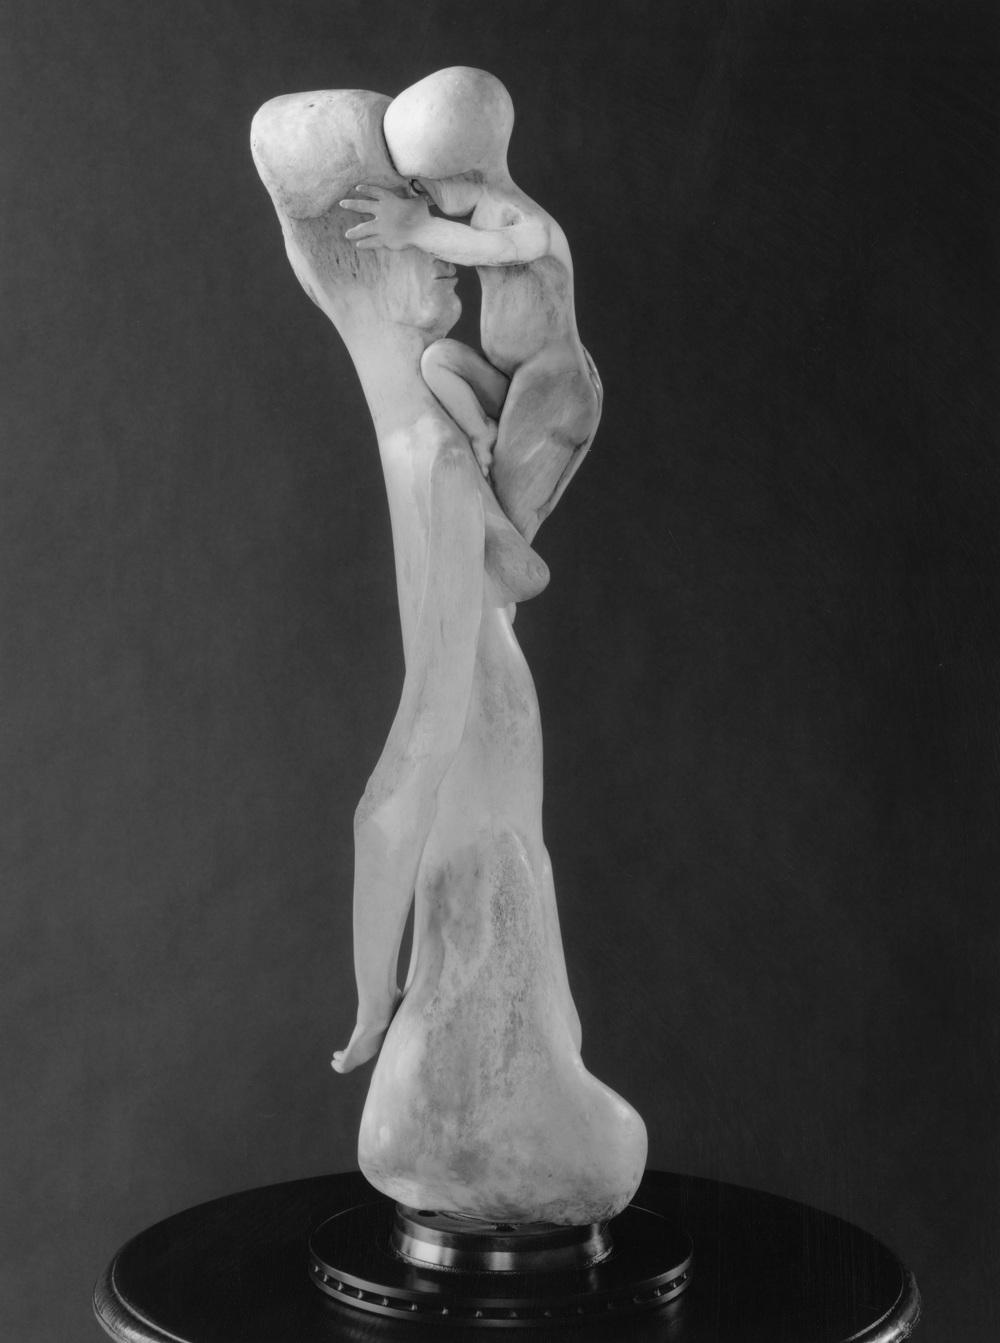 Game - Bones Sculpture by Jerry Hardin